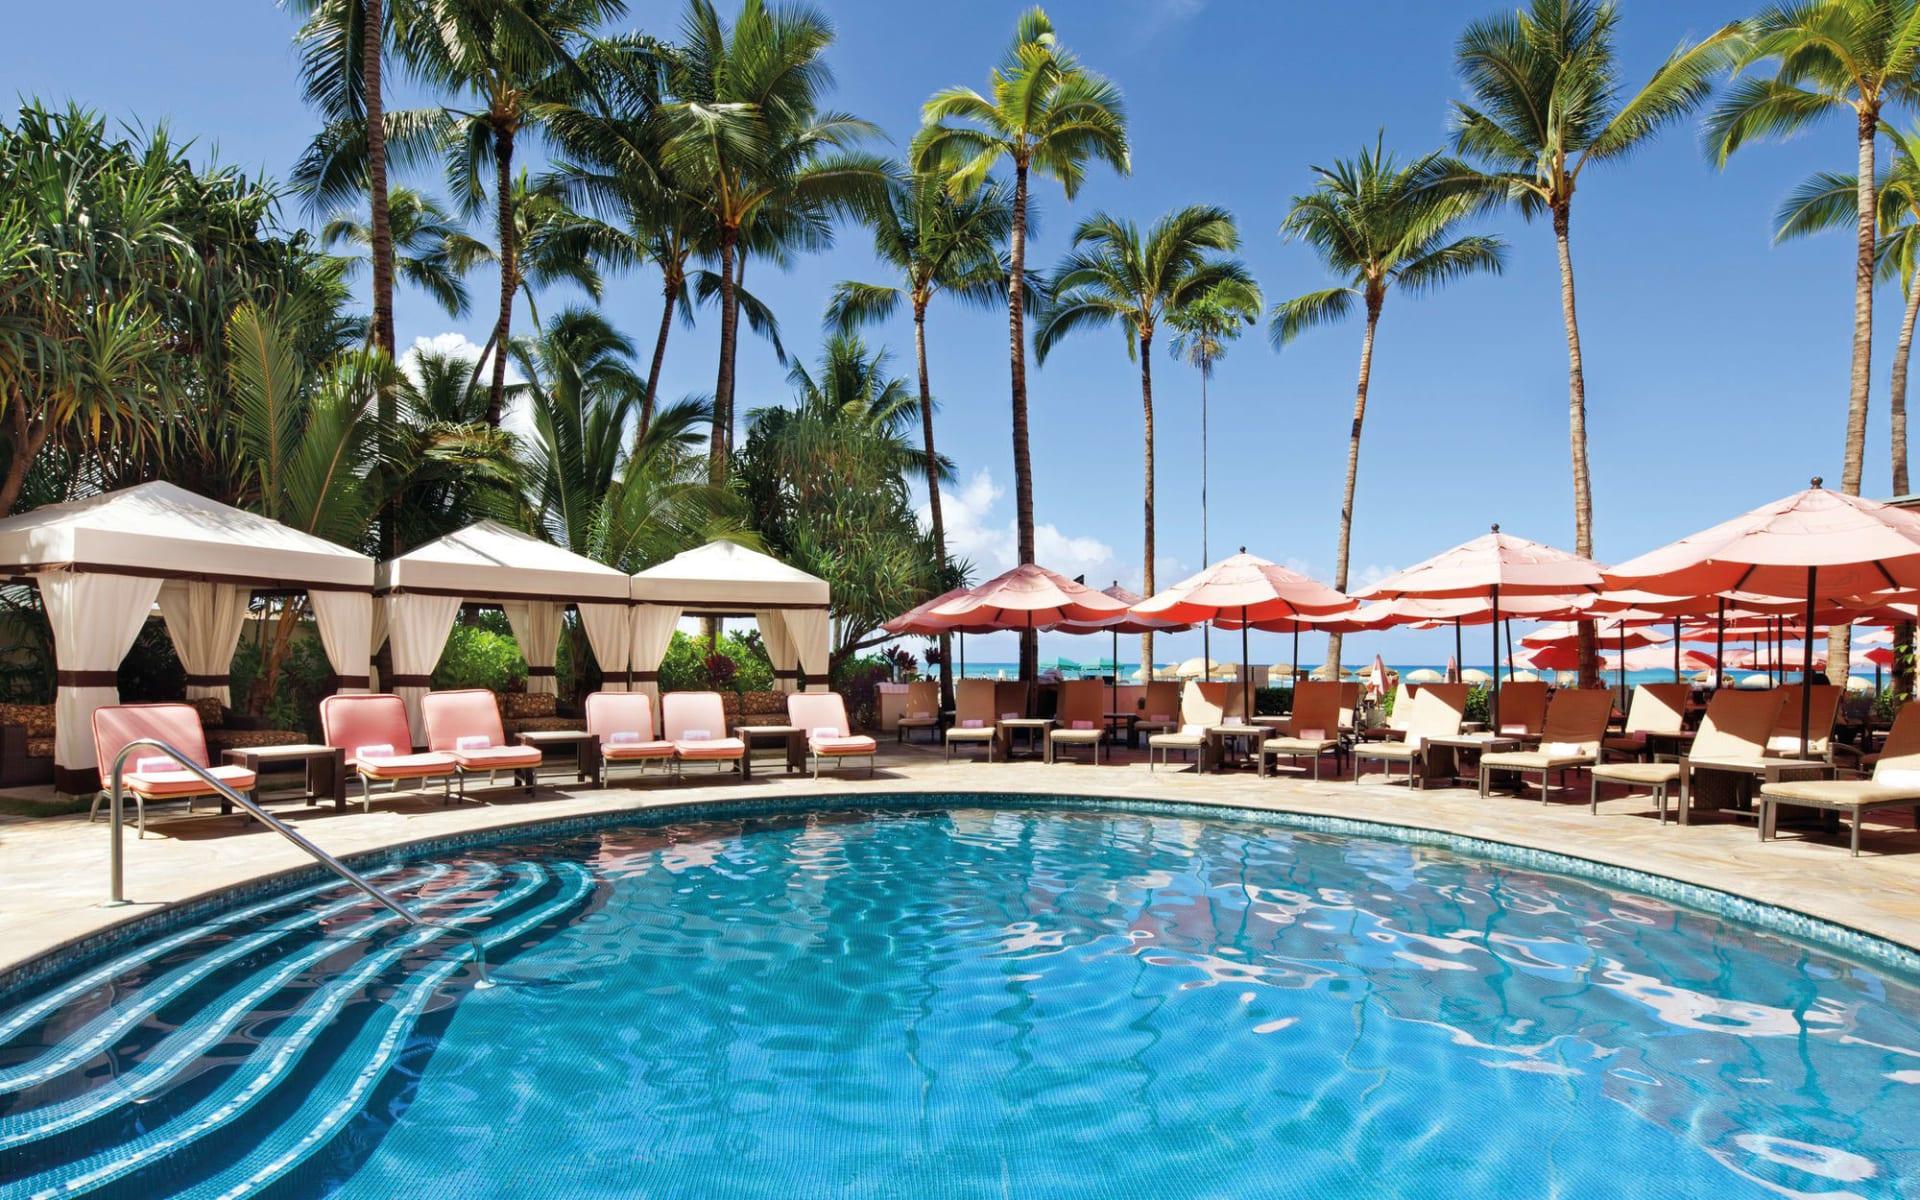 The Royal Hawaiian Resort in Honolulu - Oahu: Royal Hawaiian - Swimmingpool